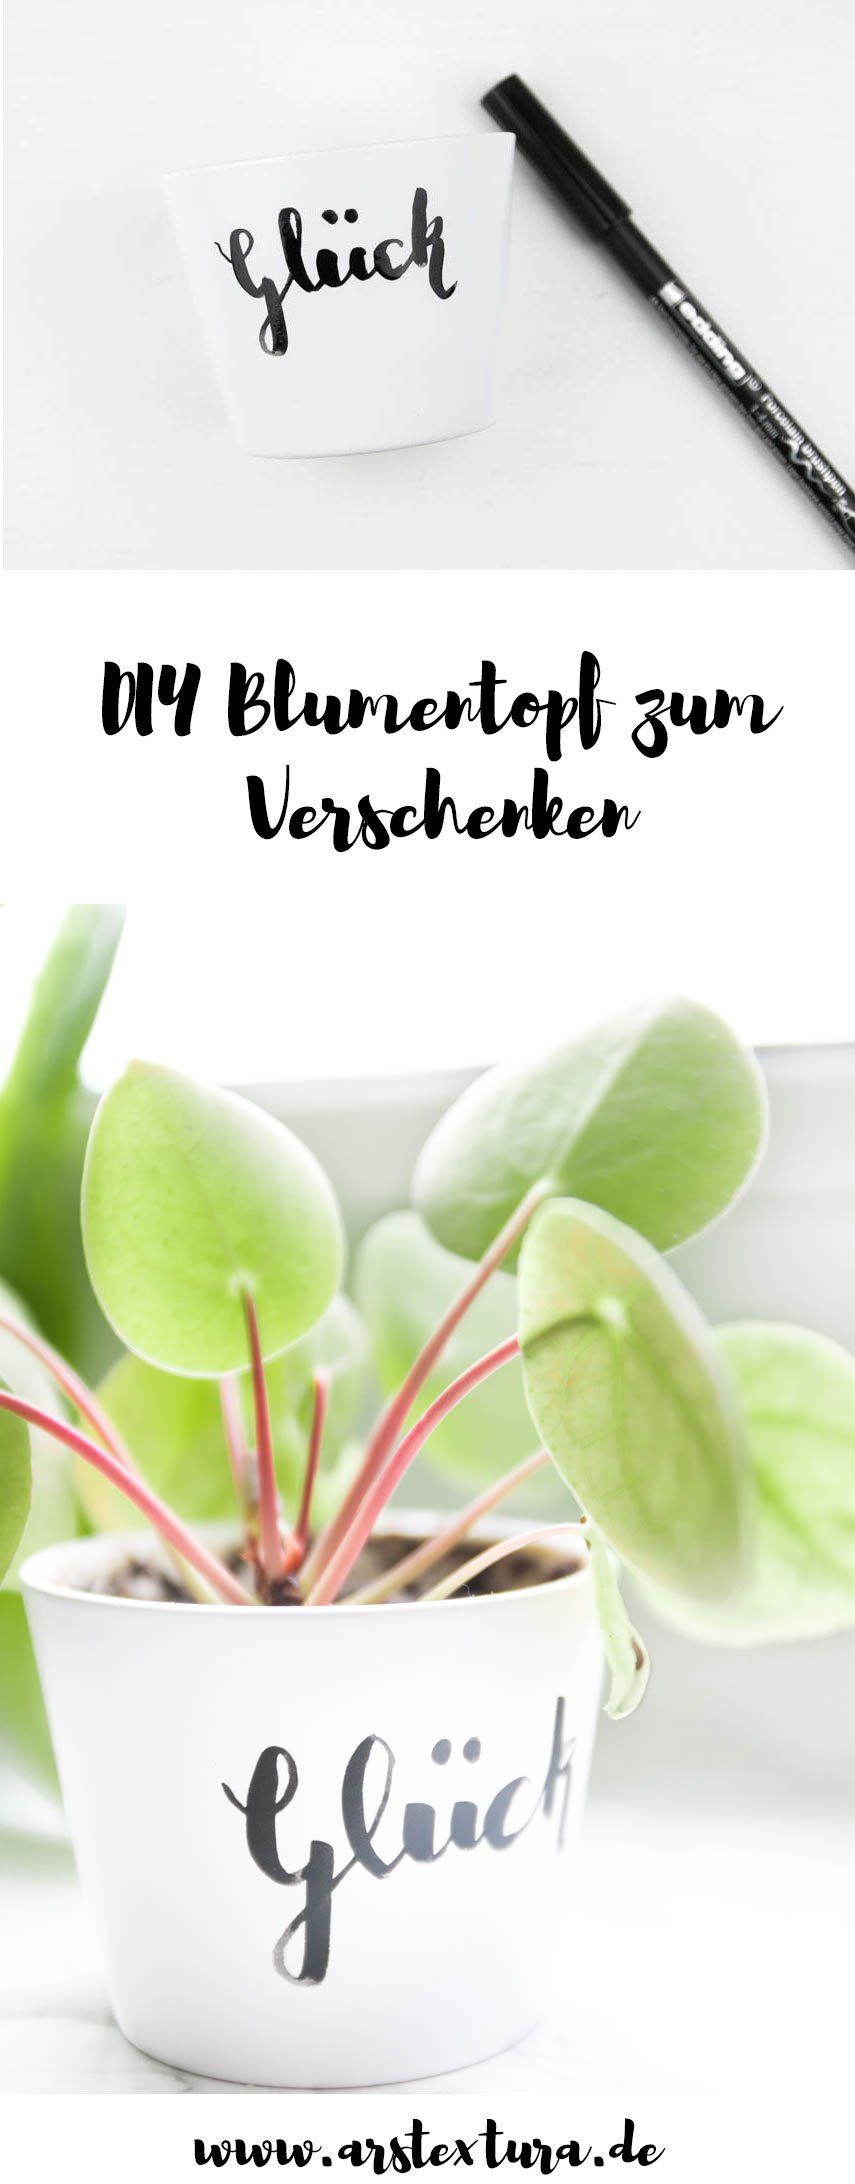 DIY Blumentopf zu verschenken mit Pillen Ableger